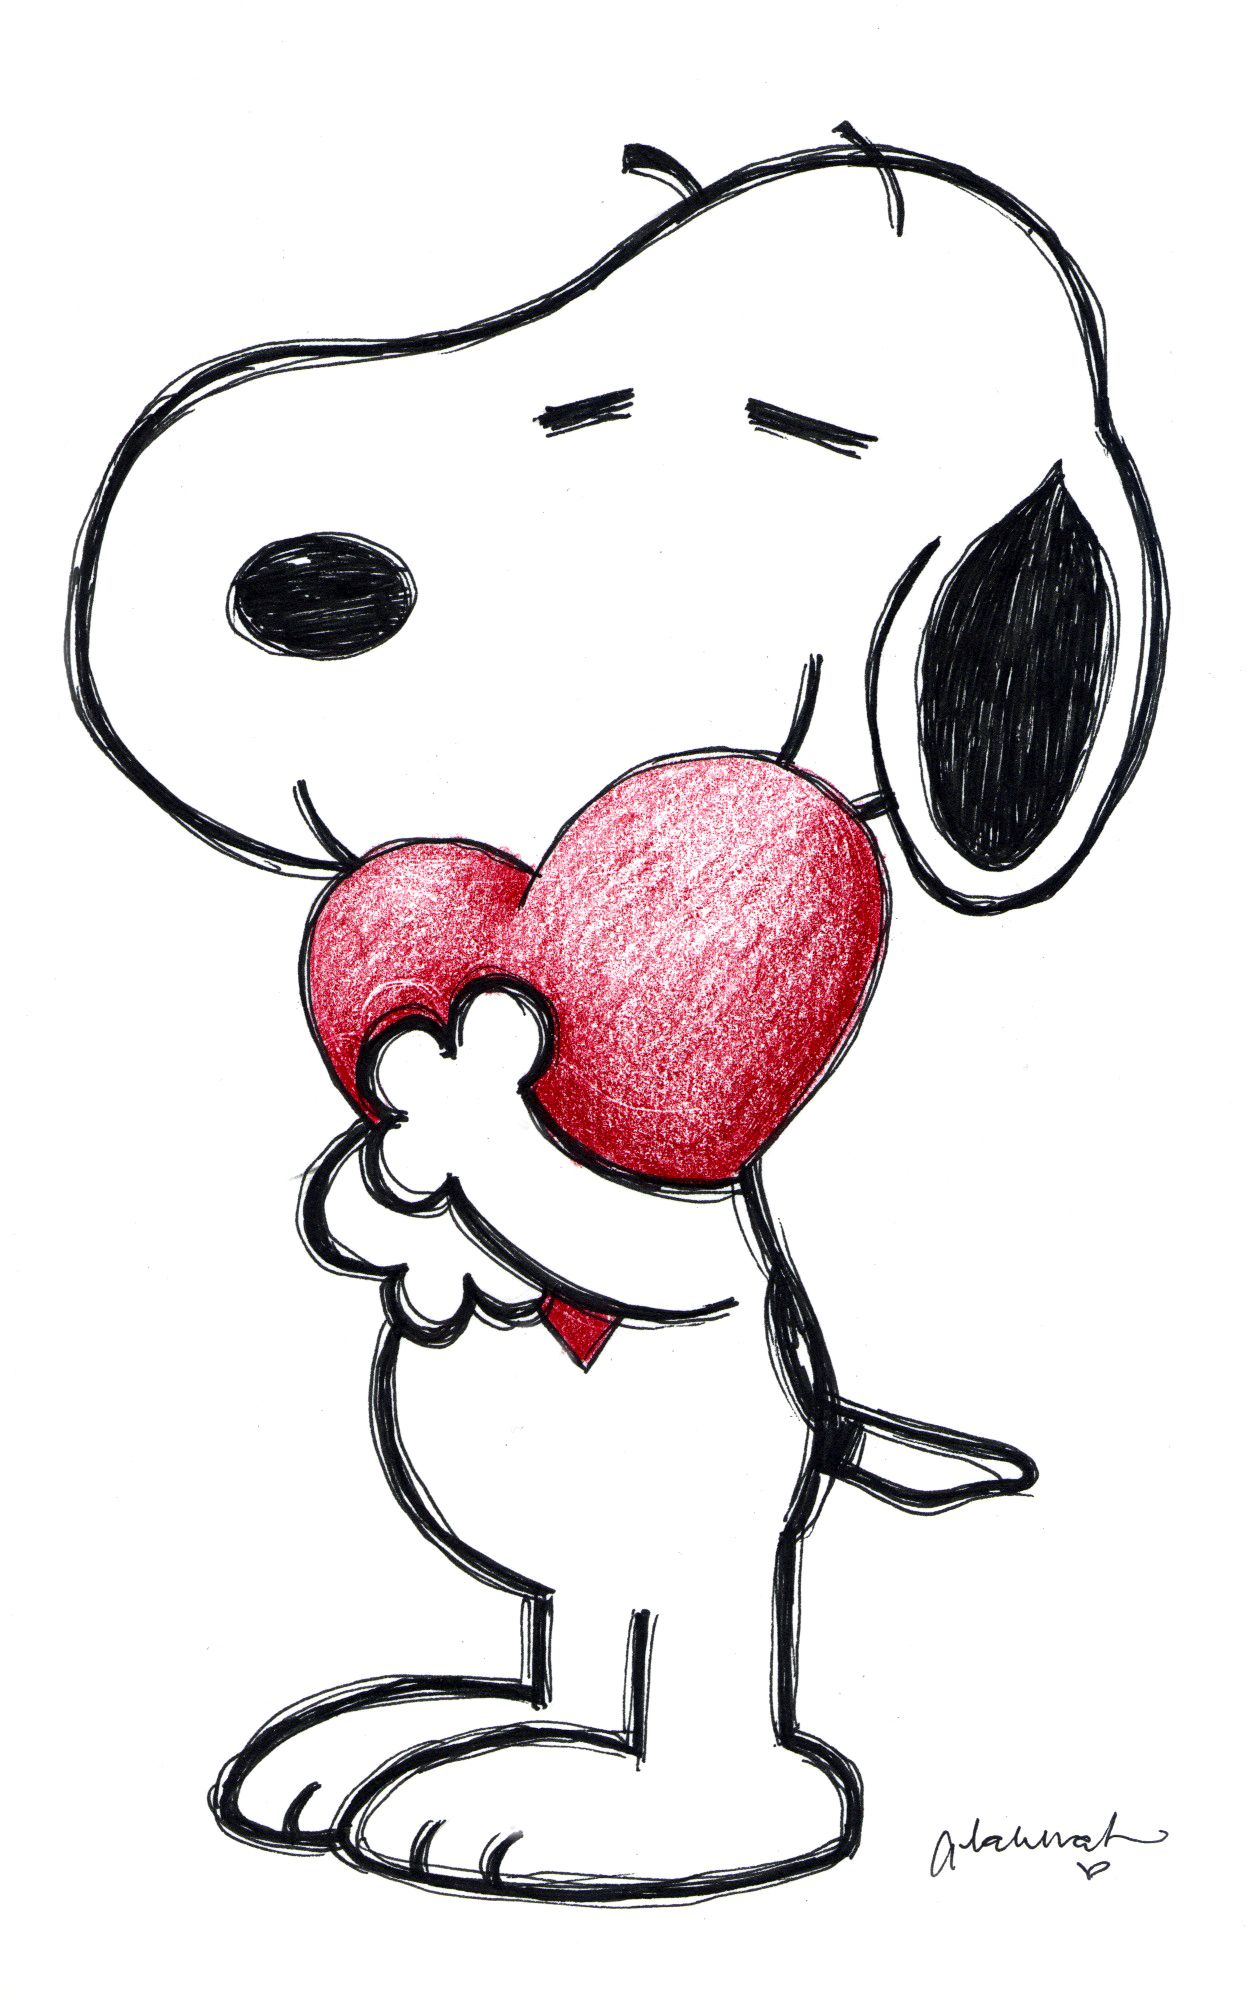 Pin De Devida Benavides En My Style Snoopy Dibujos Dibujos Bonitos Fondo De Pantalla Snoopy